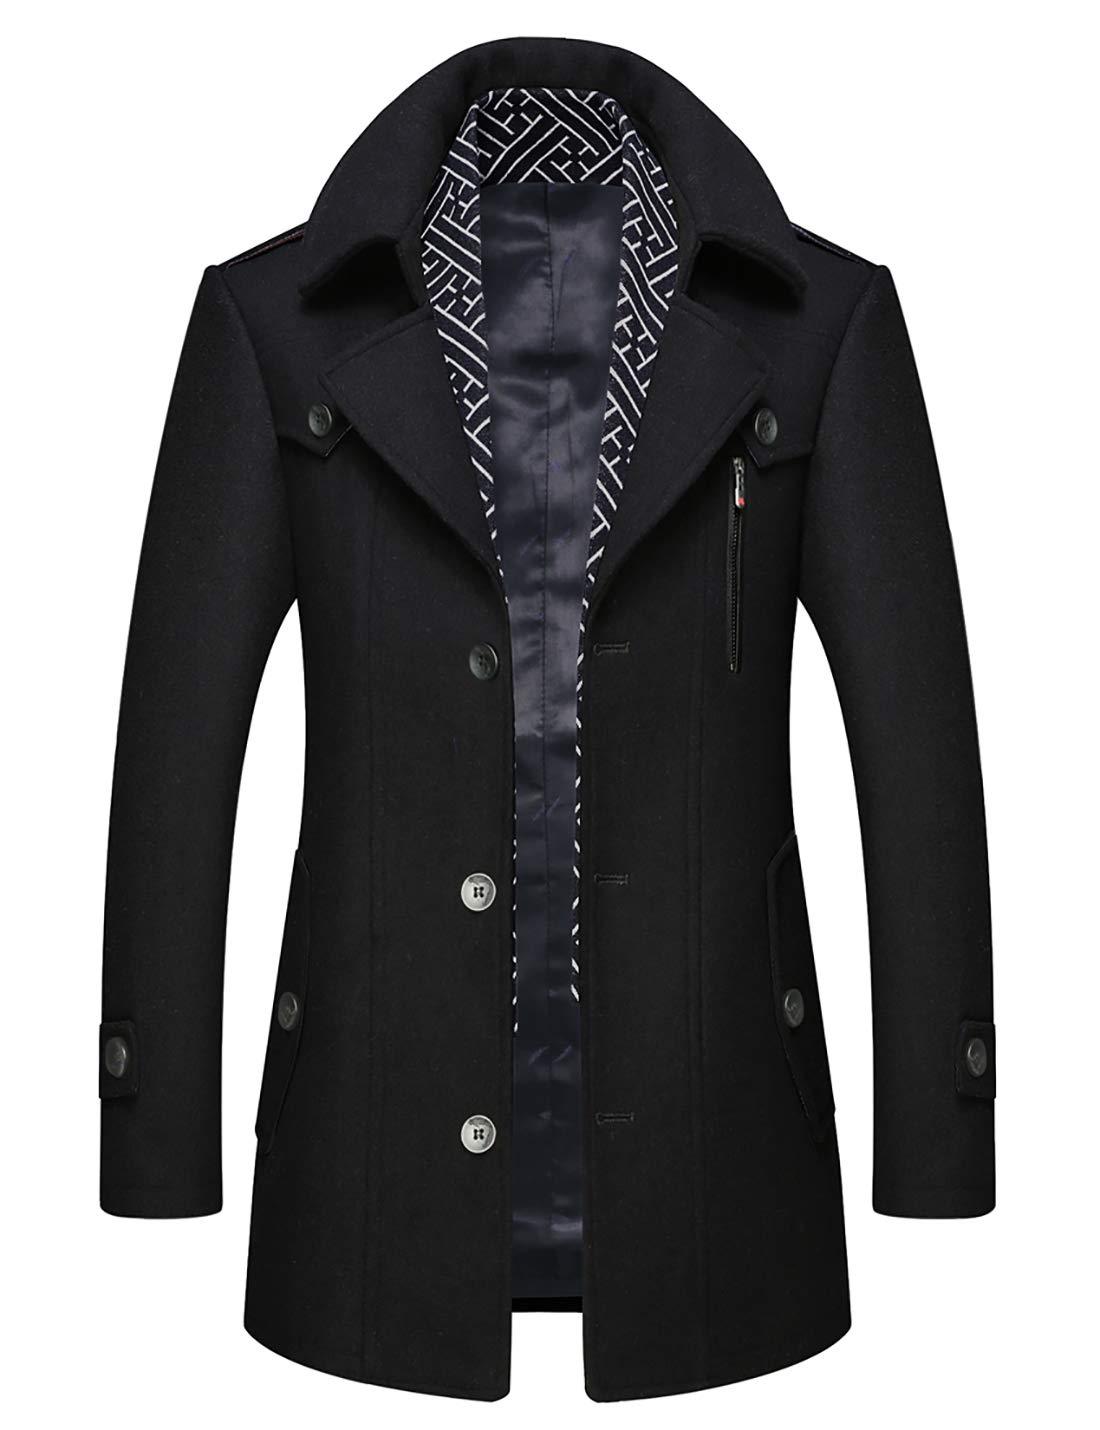 zeetoo Men's Wool Peacoat Winter Buttons Jacket Windproof Classic Pea Coat Black X-Small by zeetoo